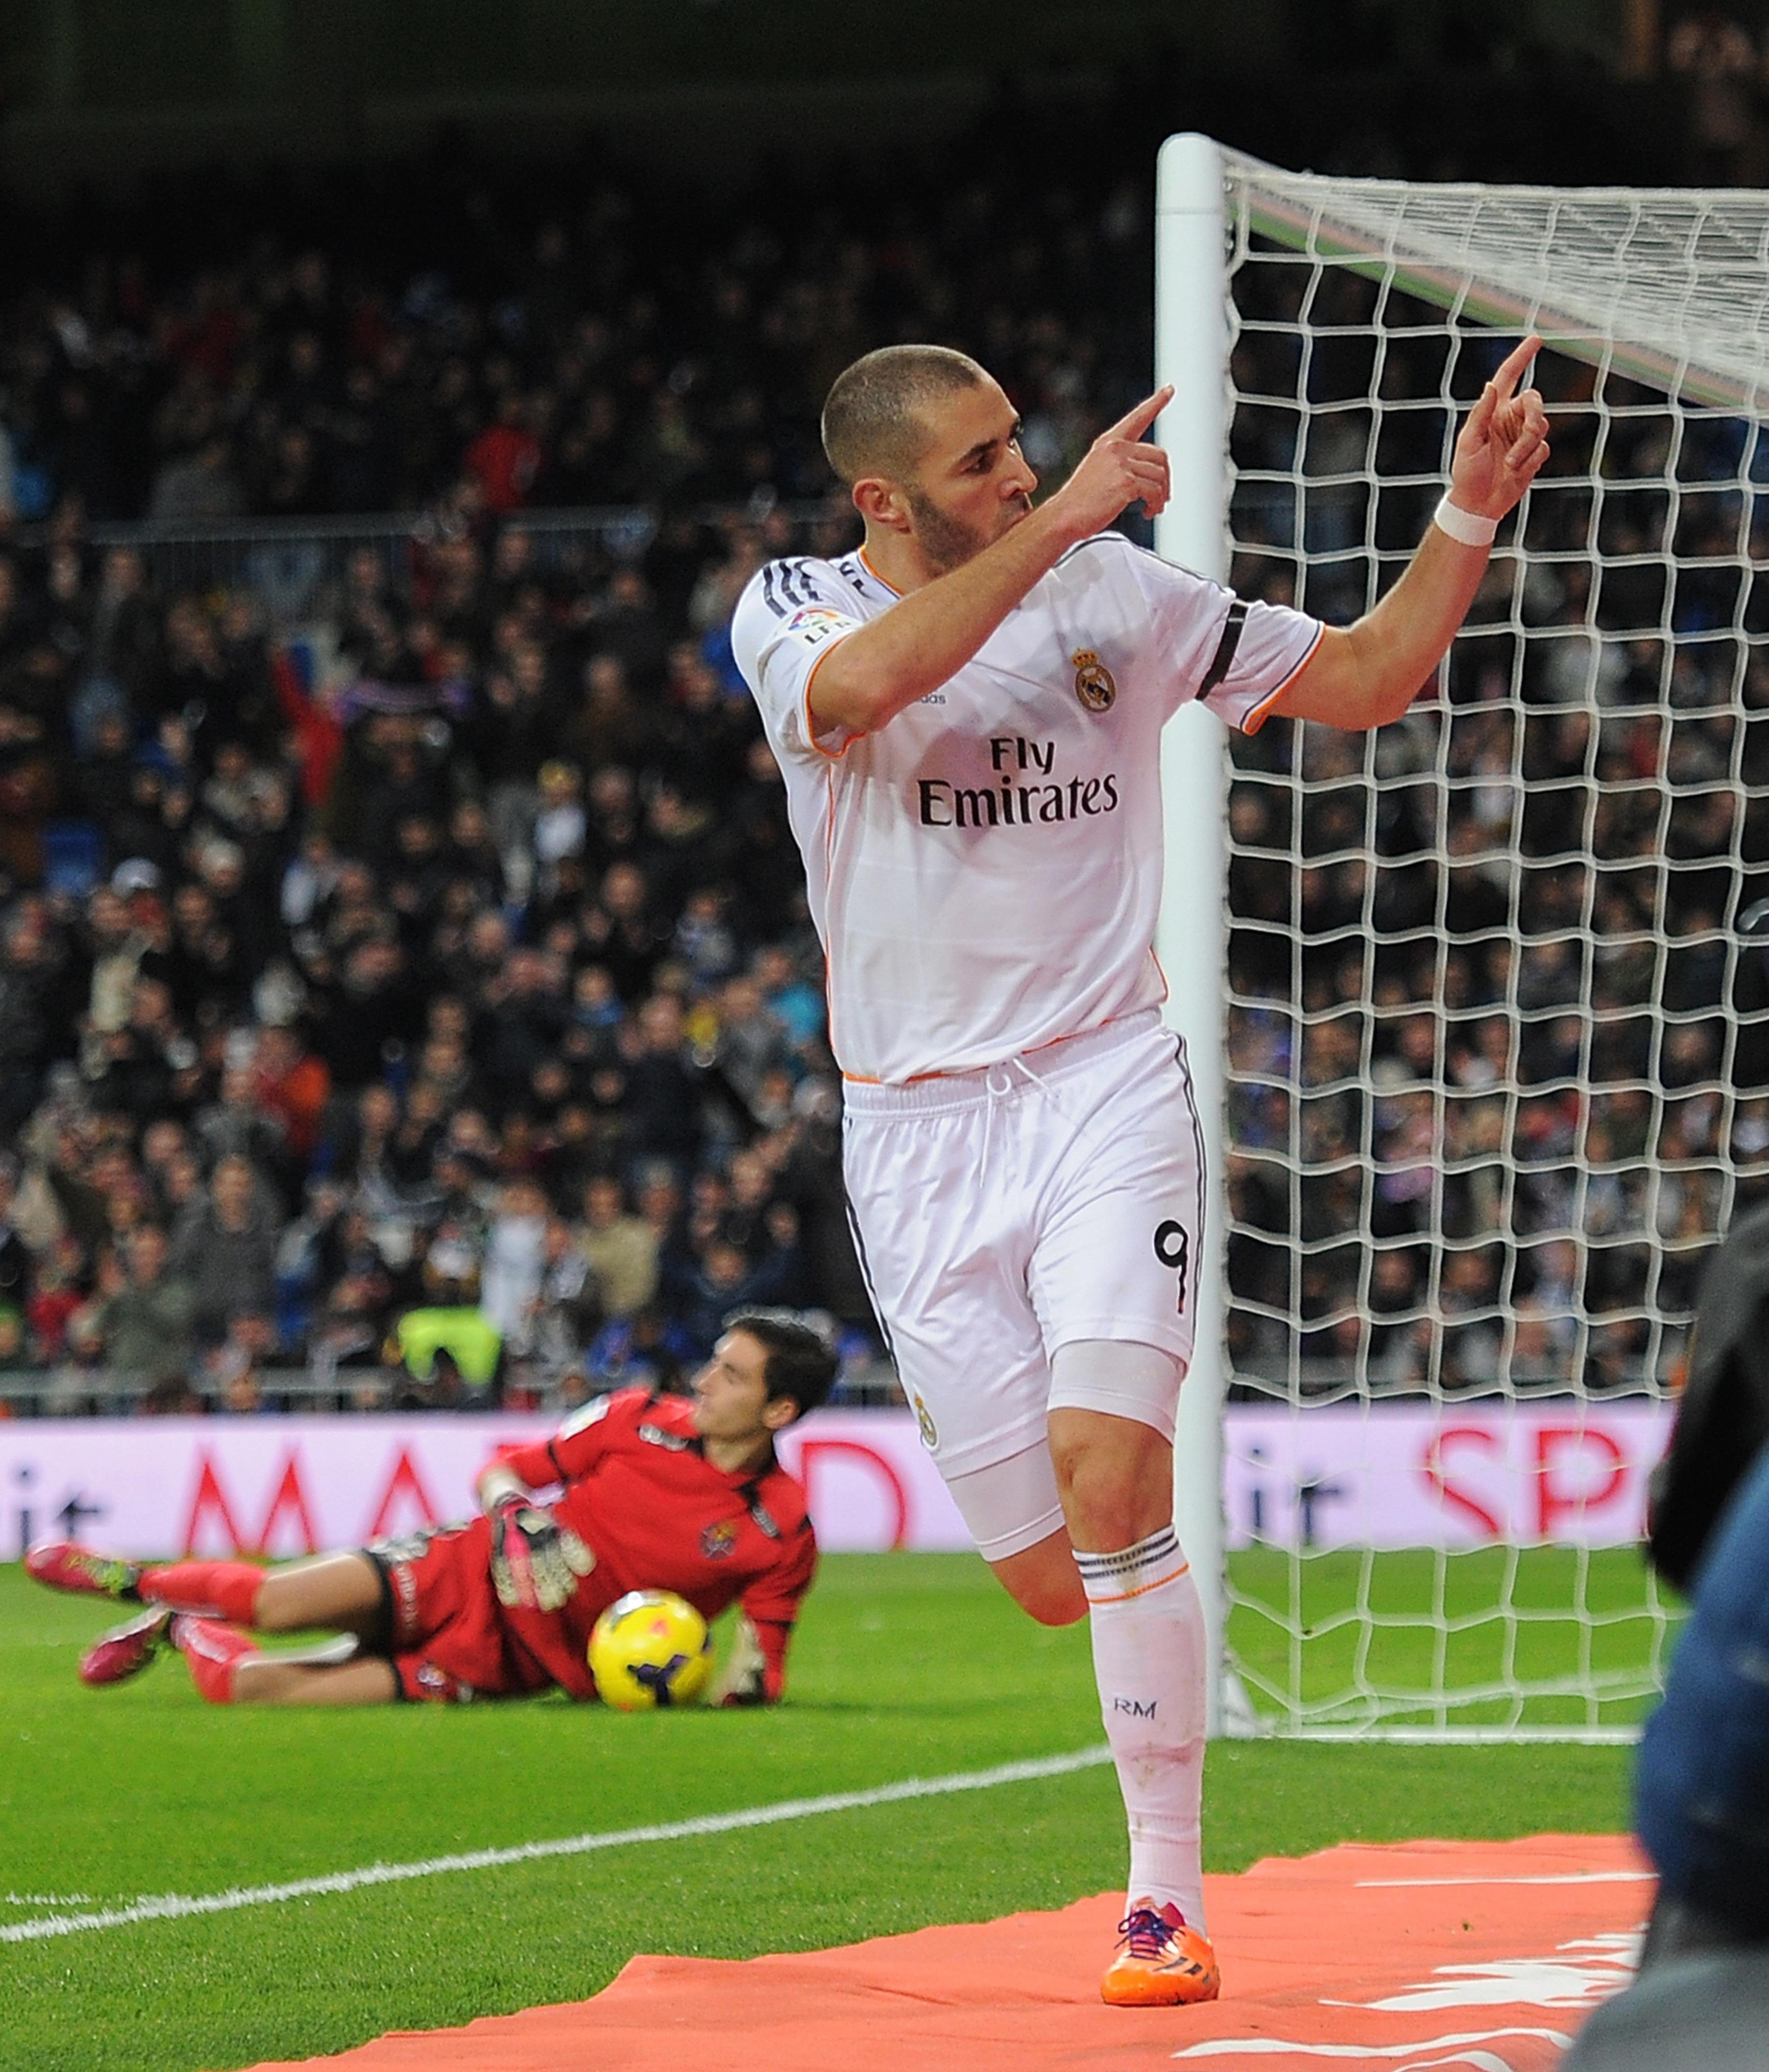 La Liga, Week 18: Real Madrid defeats Celta Vigo with three late goals